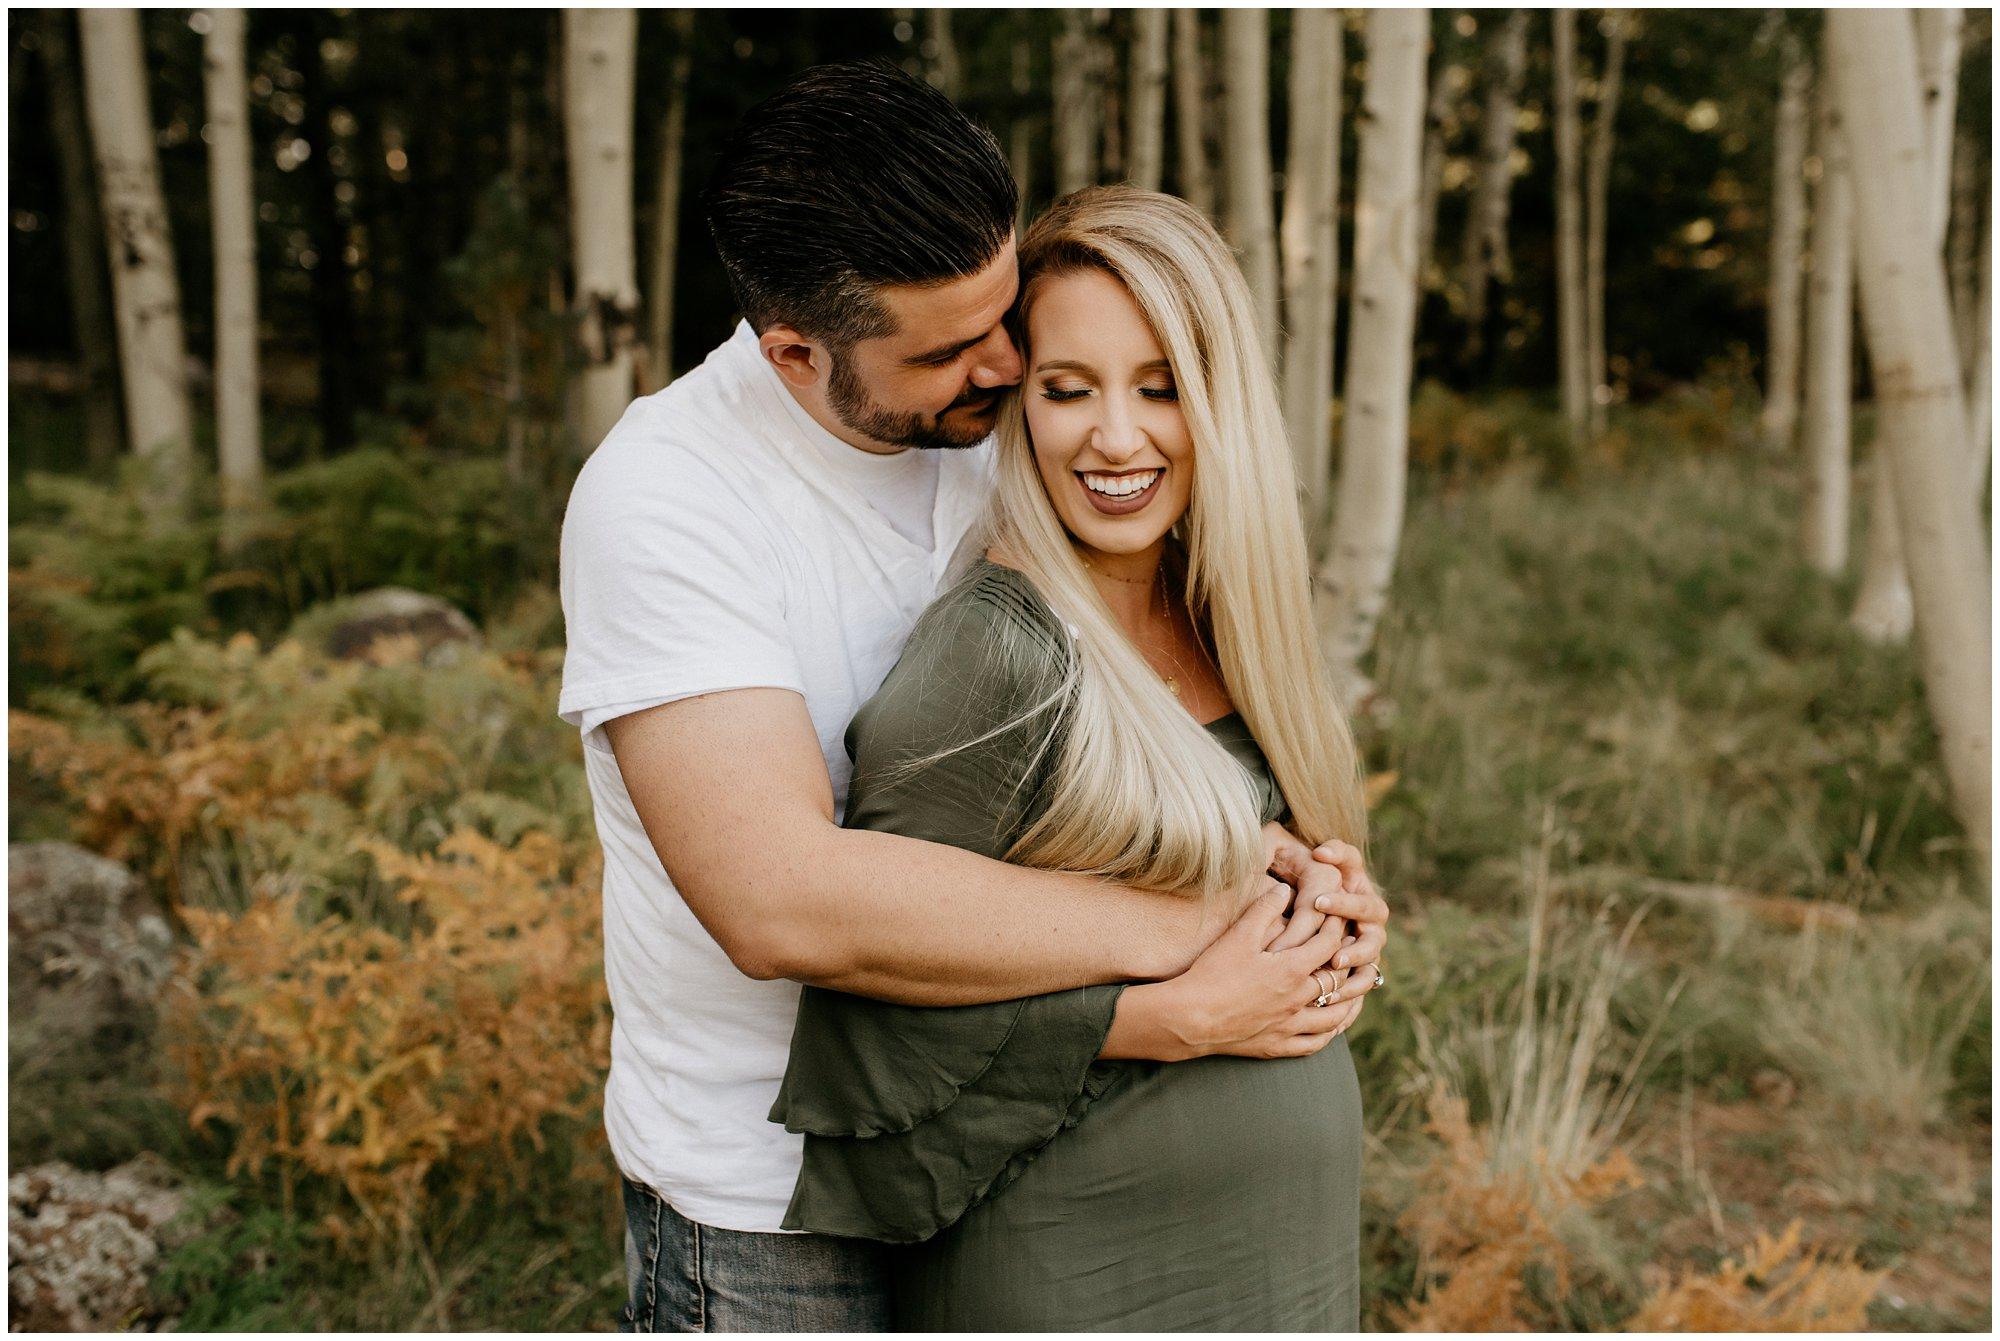 Flagstaff Aspen Tree Portrait Session - Gabby + Gary - Ashtyn Nicole Photo_0011.jpg